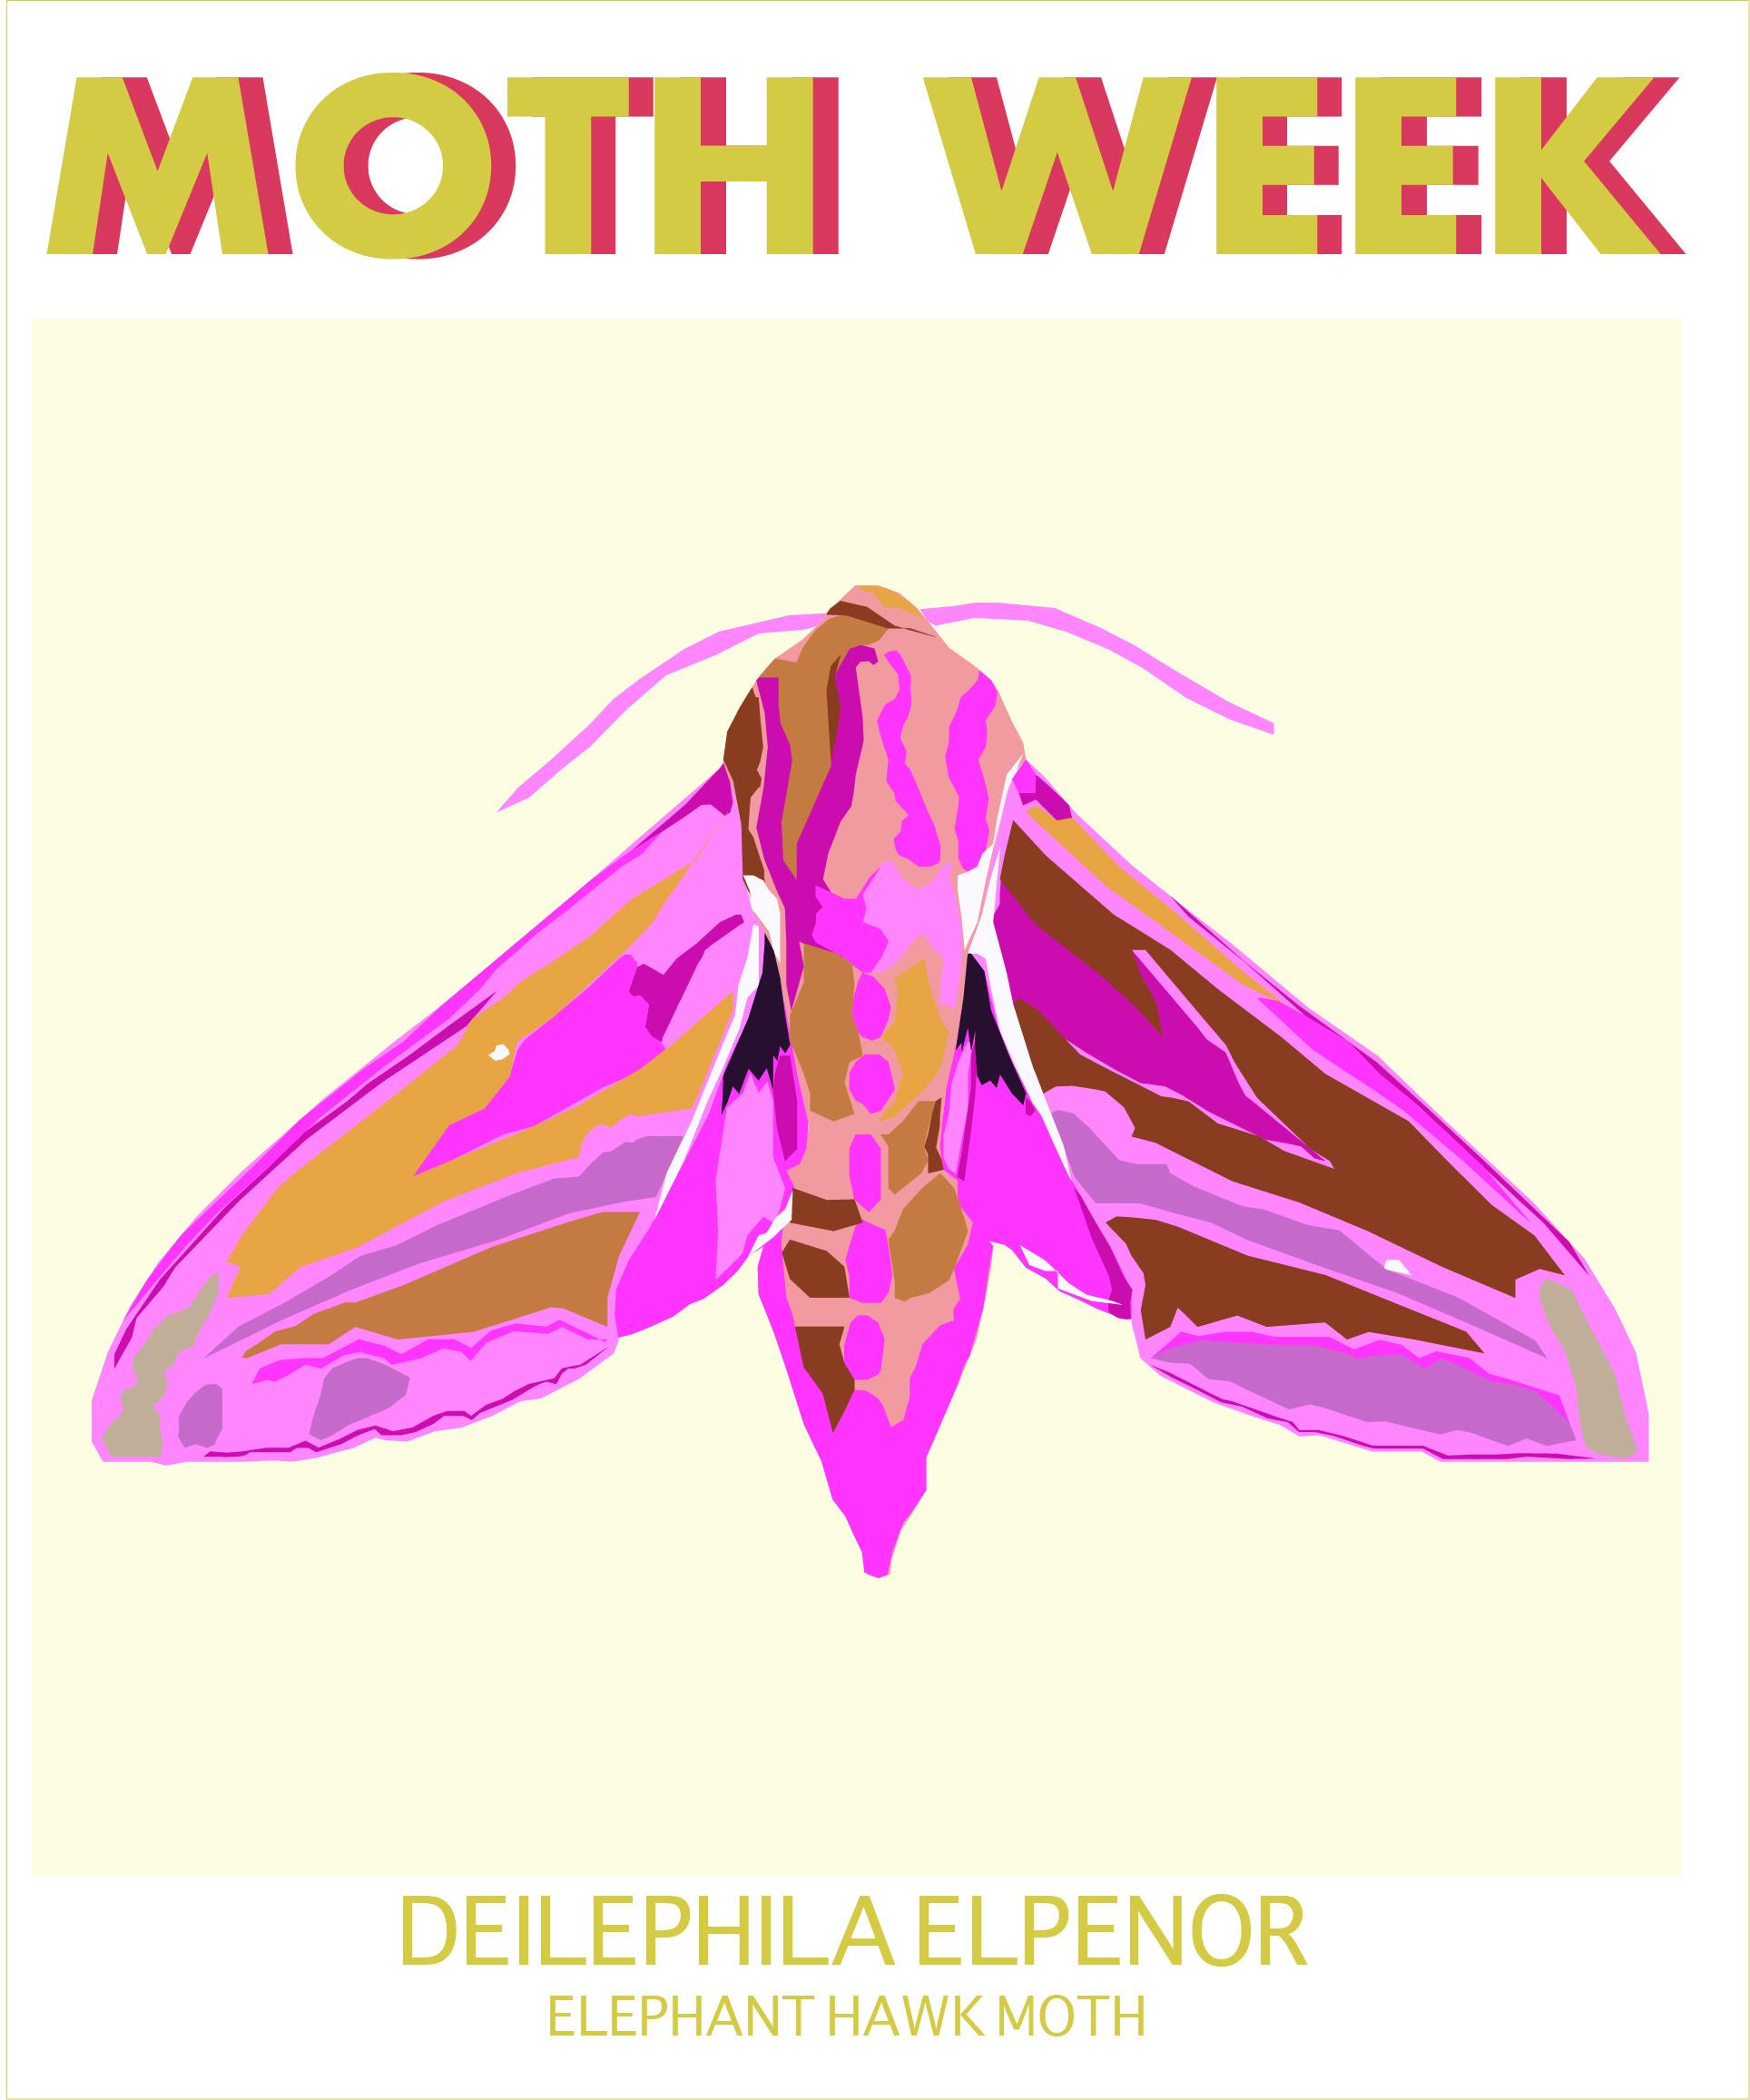 moth week Elephant .jpg